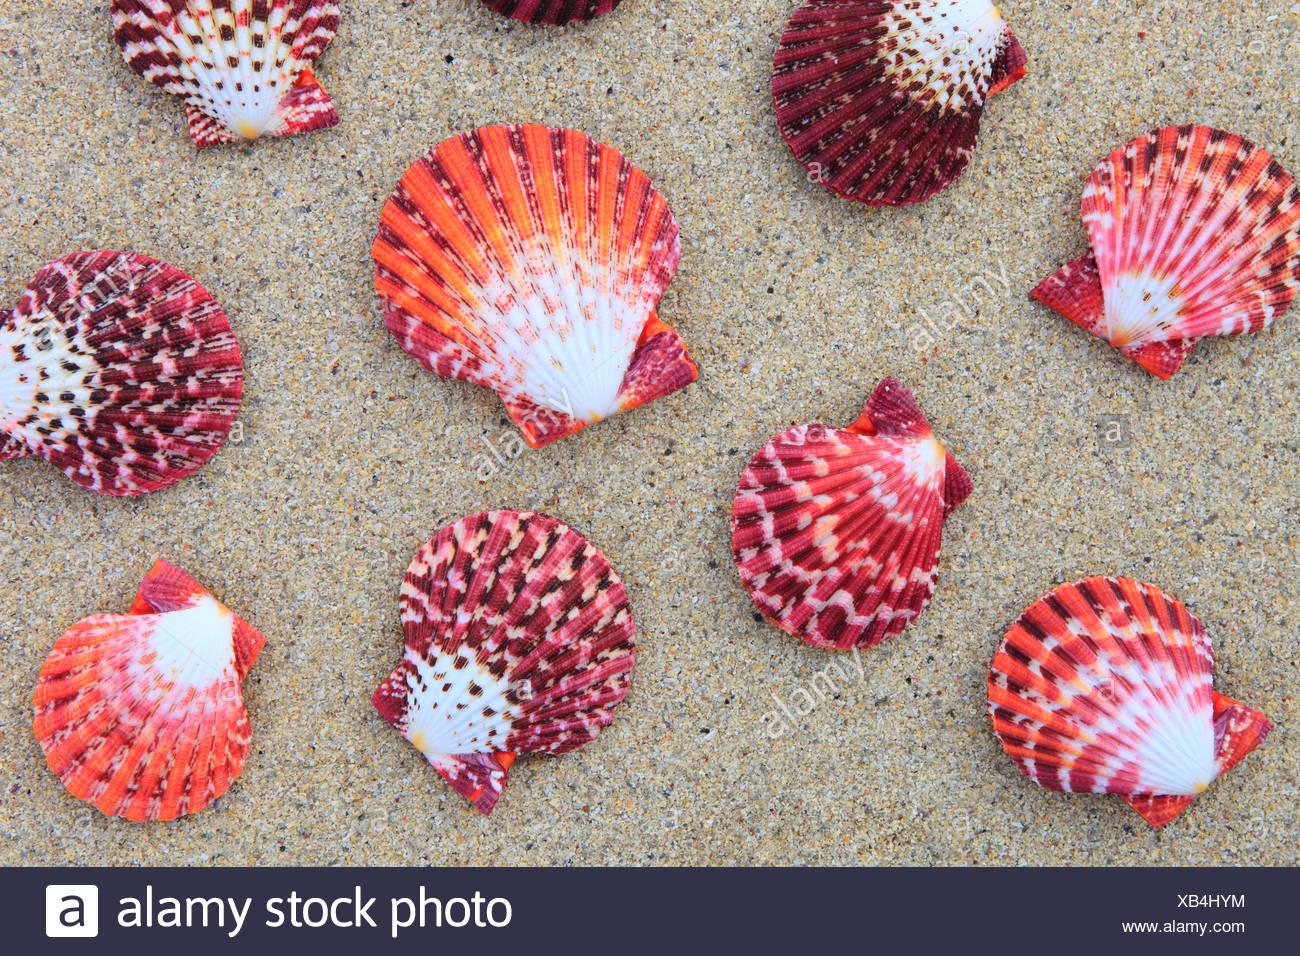 Great Britain, coast, sea, marine animal, mussels, mollusc, nature, North Sea, Pecten pallium, sand, sand beach, shellfish, Scot - Stock Image